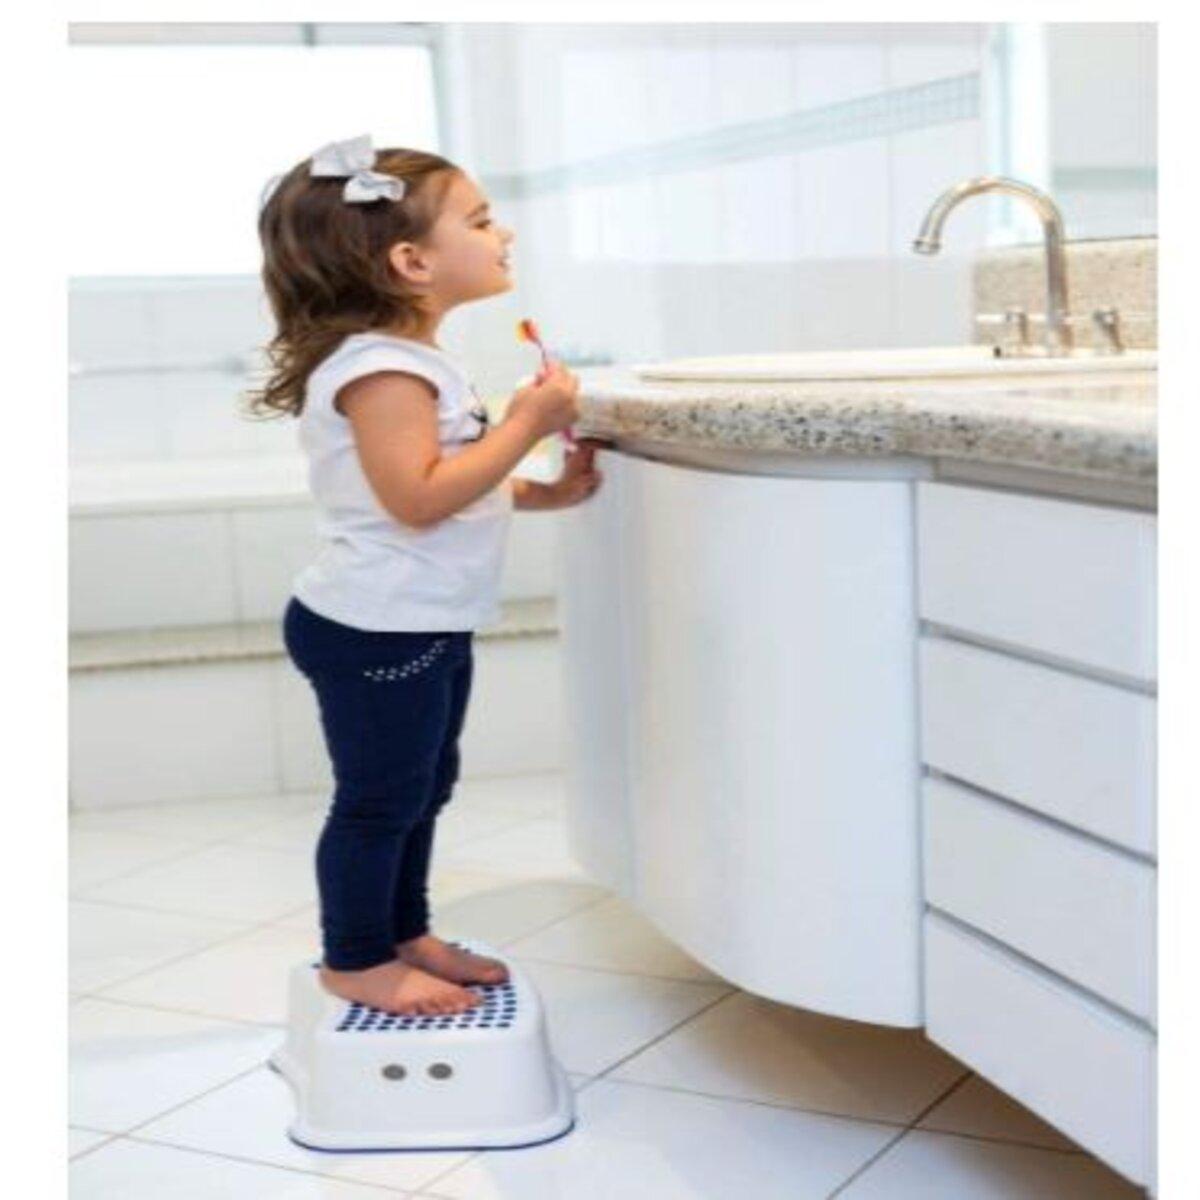 Degrau Infantil Step Dots Antiderrapante Clingo Cinza